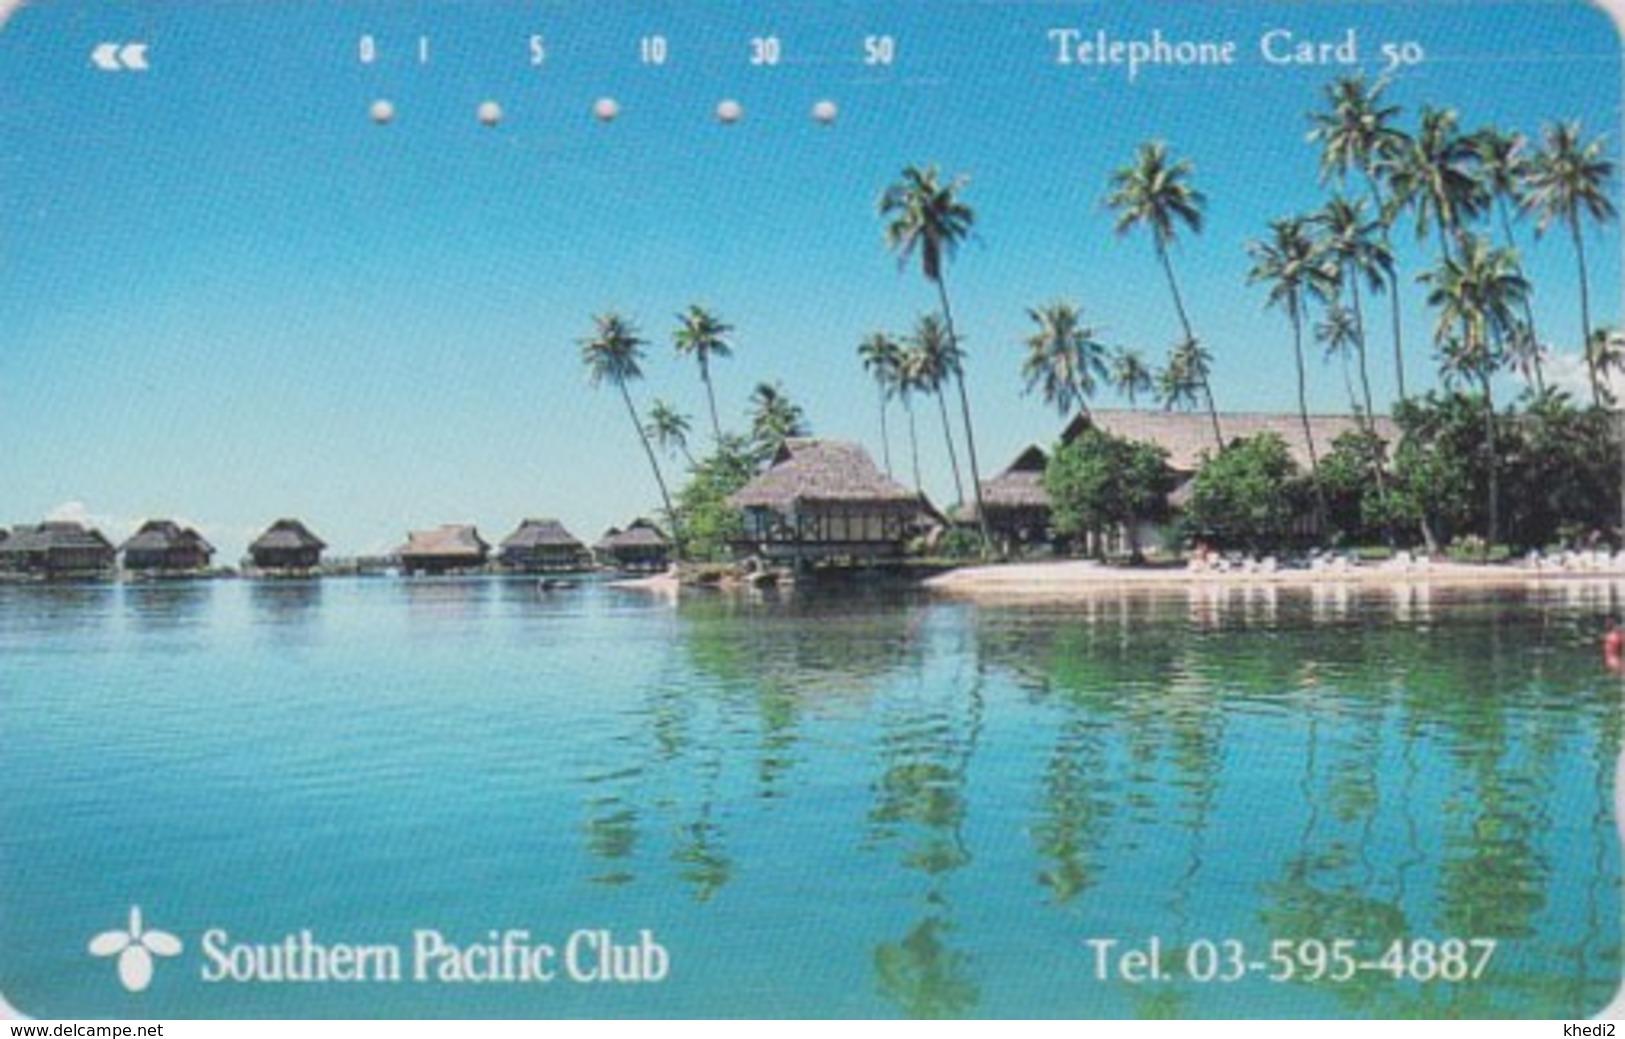 TC Japon / 110-76735 - TAHITI / PF POLYNESIE FRANCAISE - Southern Pacific Club - FRENCH POLYNESIA Japan Phonecard -  33 - Paysages